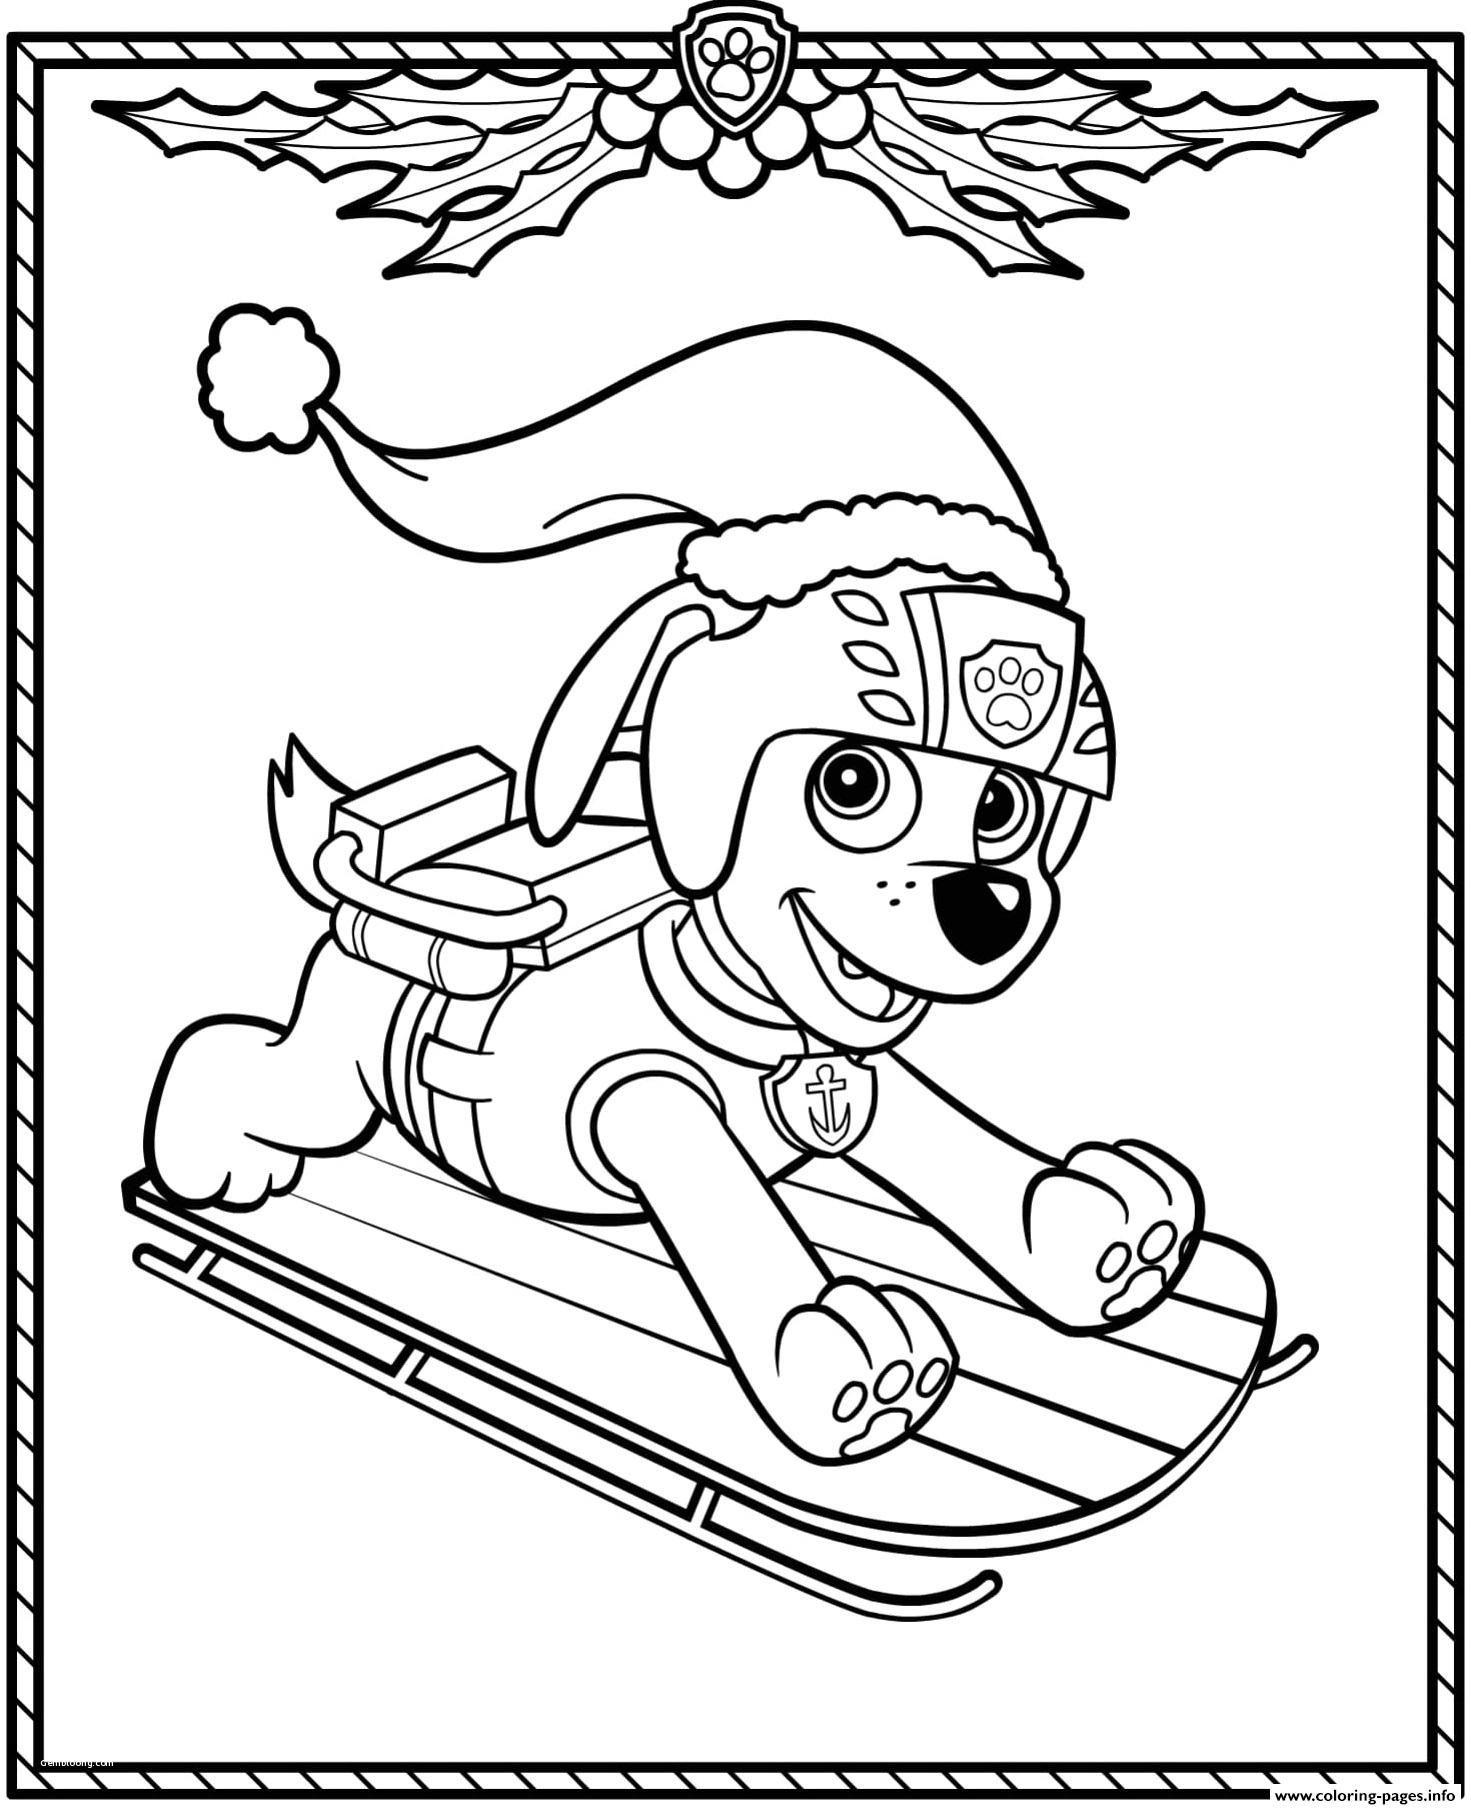 Christmas Paw Patrol Coloring Pages : christmas, patrol, coloring, pages, Coloring, Pages, Colouring, Images, Christmas, Elegant, Print, Patrol, Holiday, Affiliateprogrambook.com